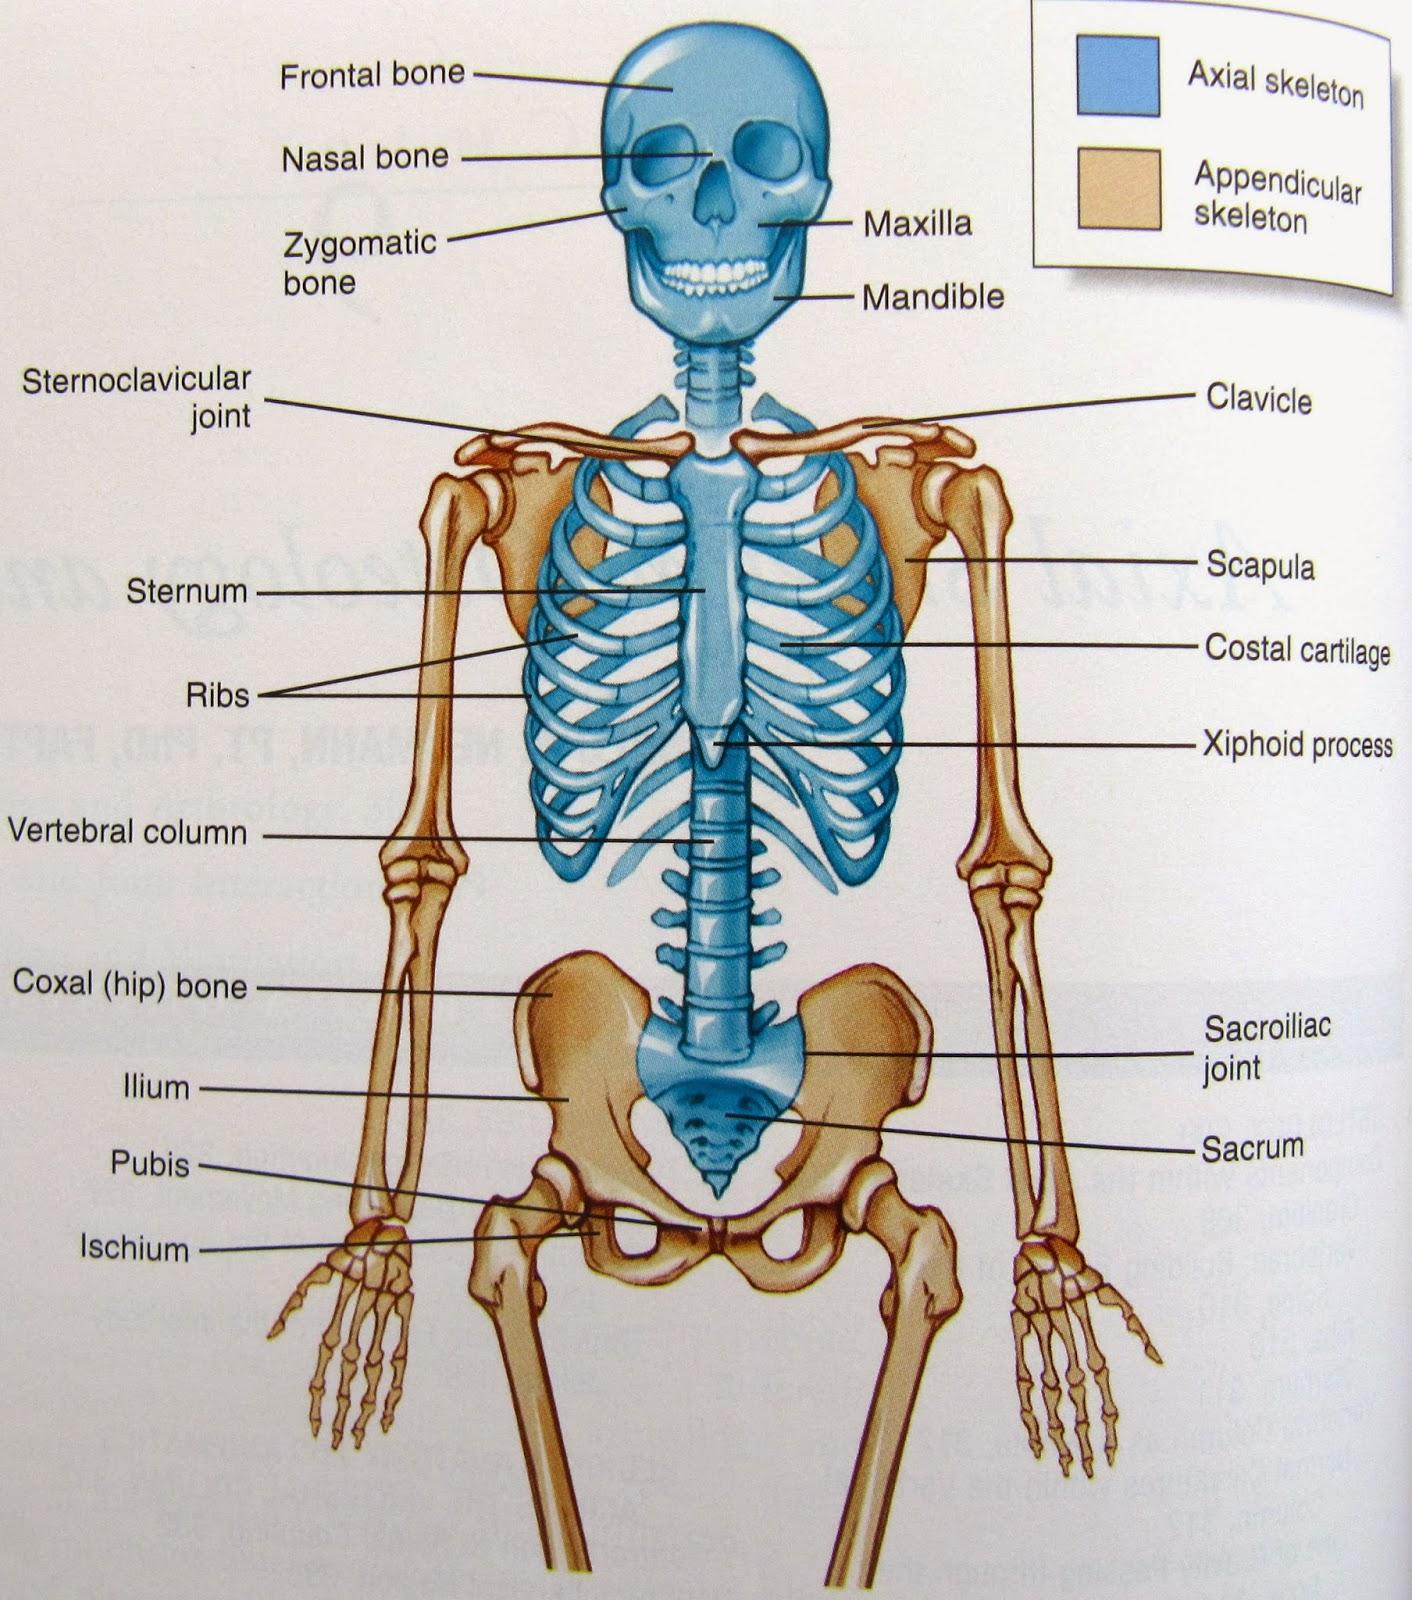 facial bones diagram not labeled digital temperature controller wiring science is wonderful human skeleton